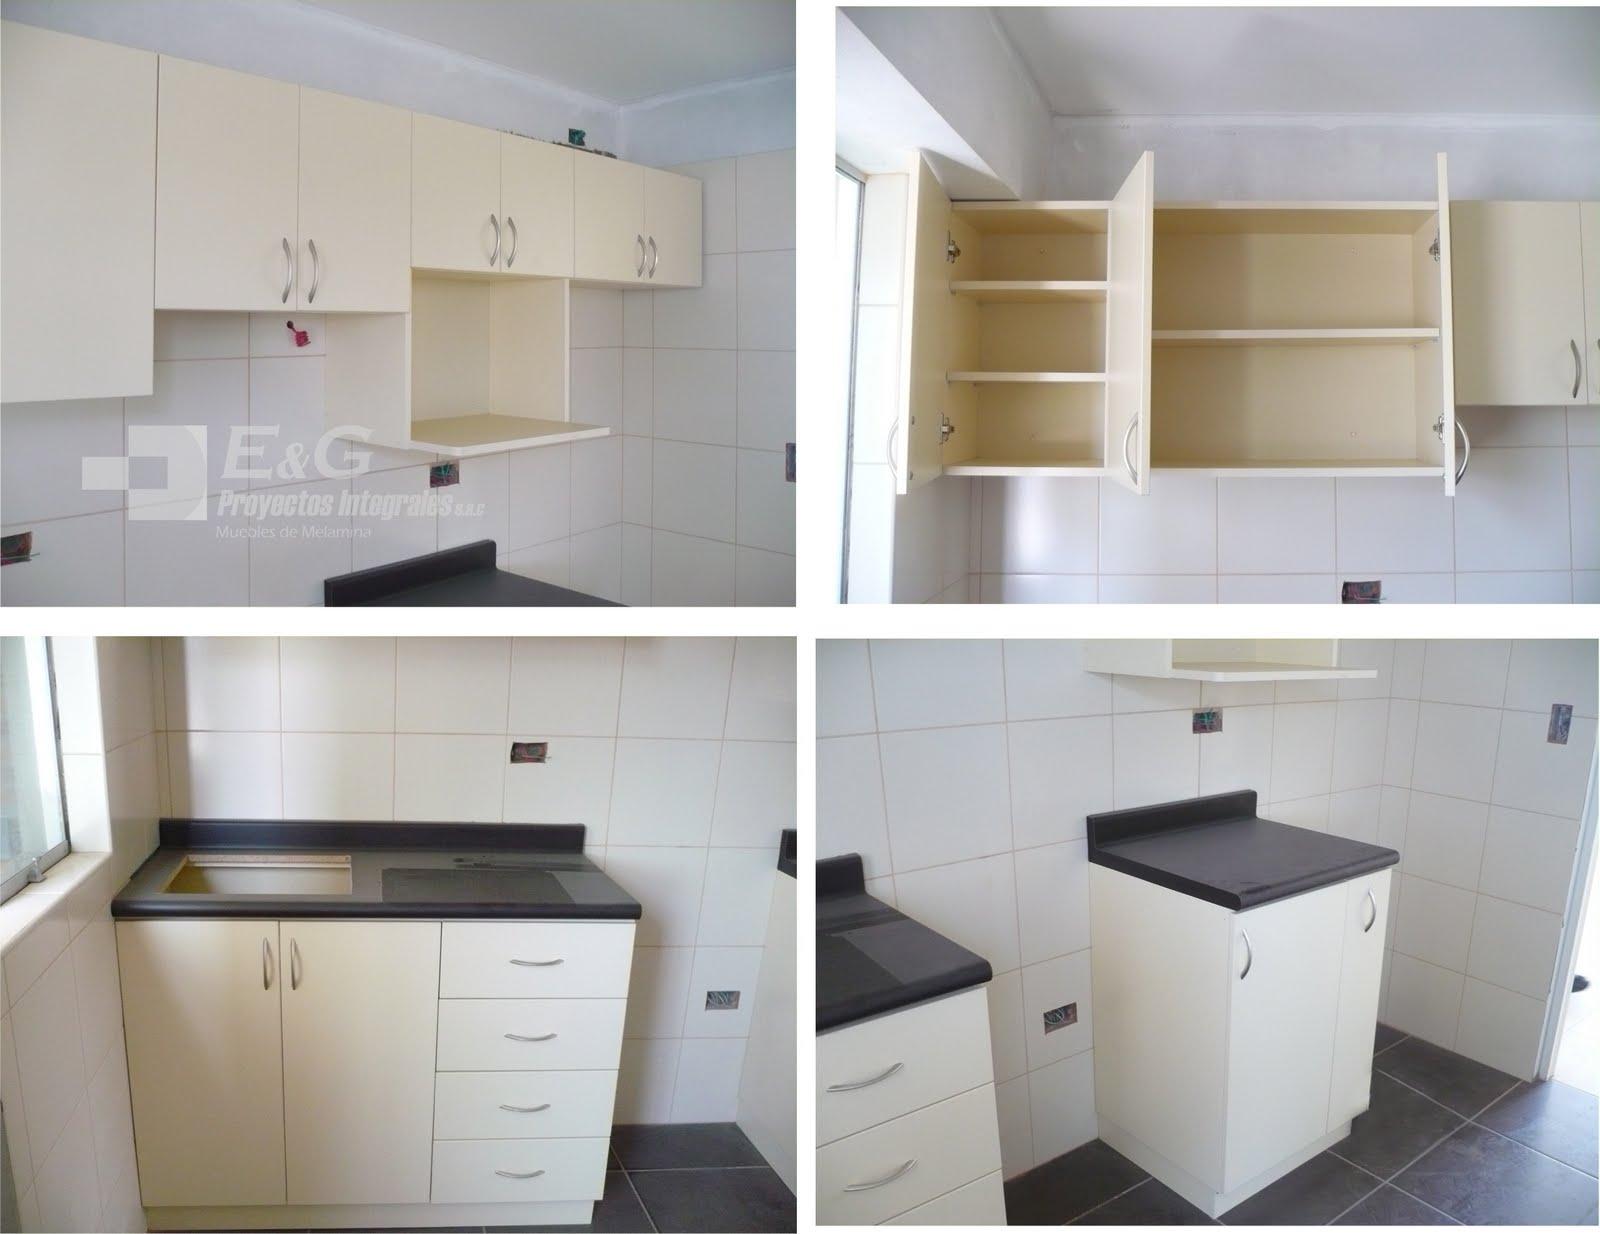 E y g proyectos integrales muebles en melamina aluminio for Muebles melamina